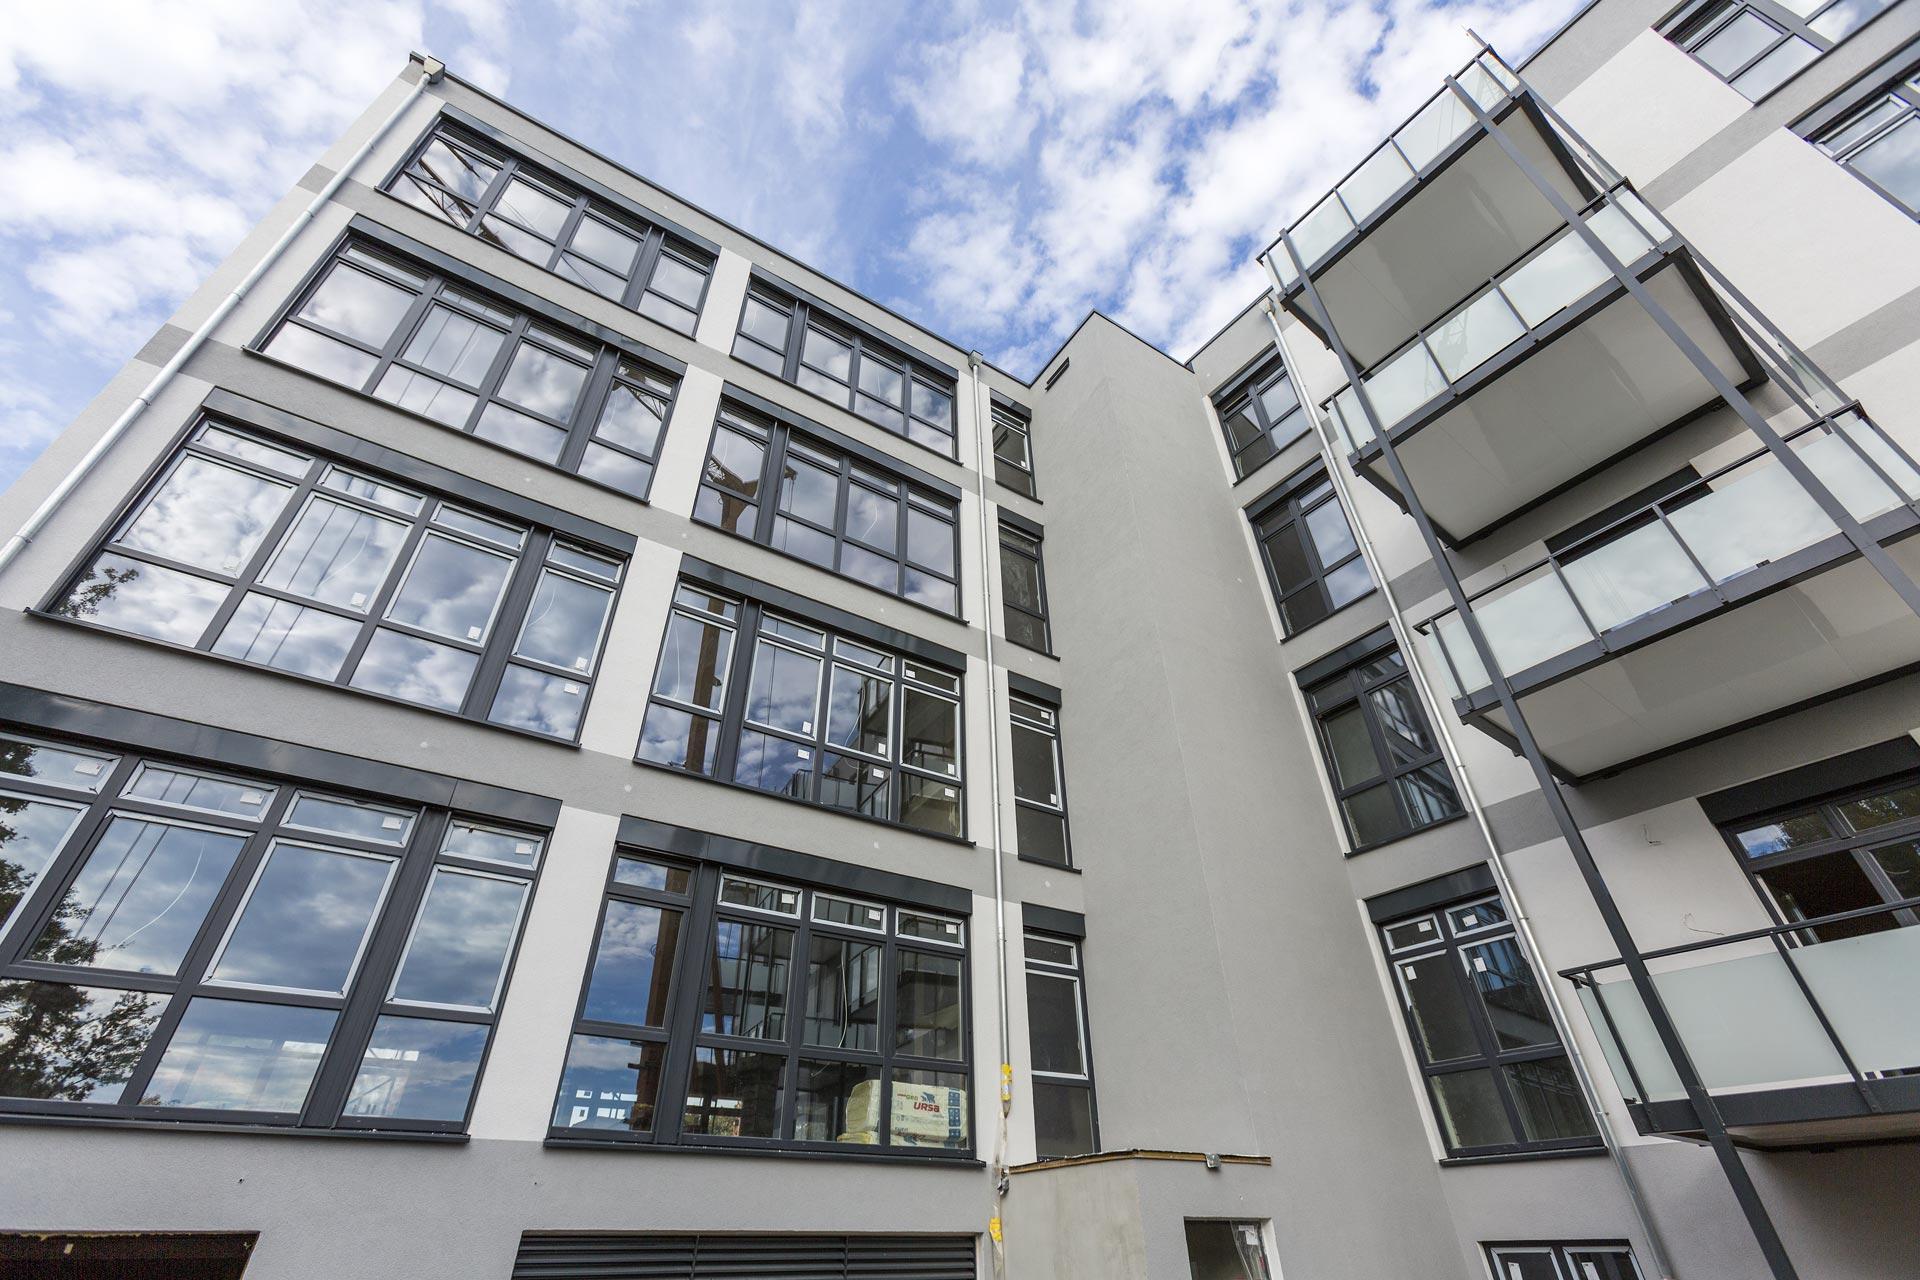 Immobilie mit 20 Lofts in Krefeld